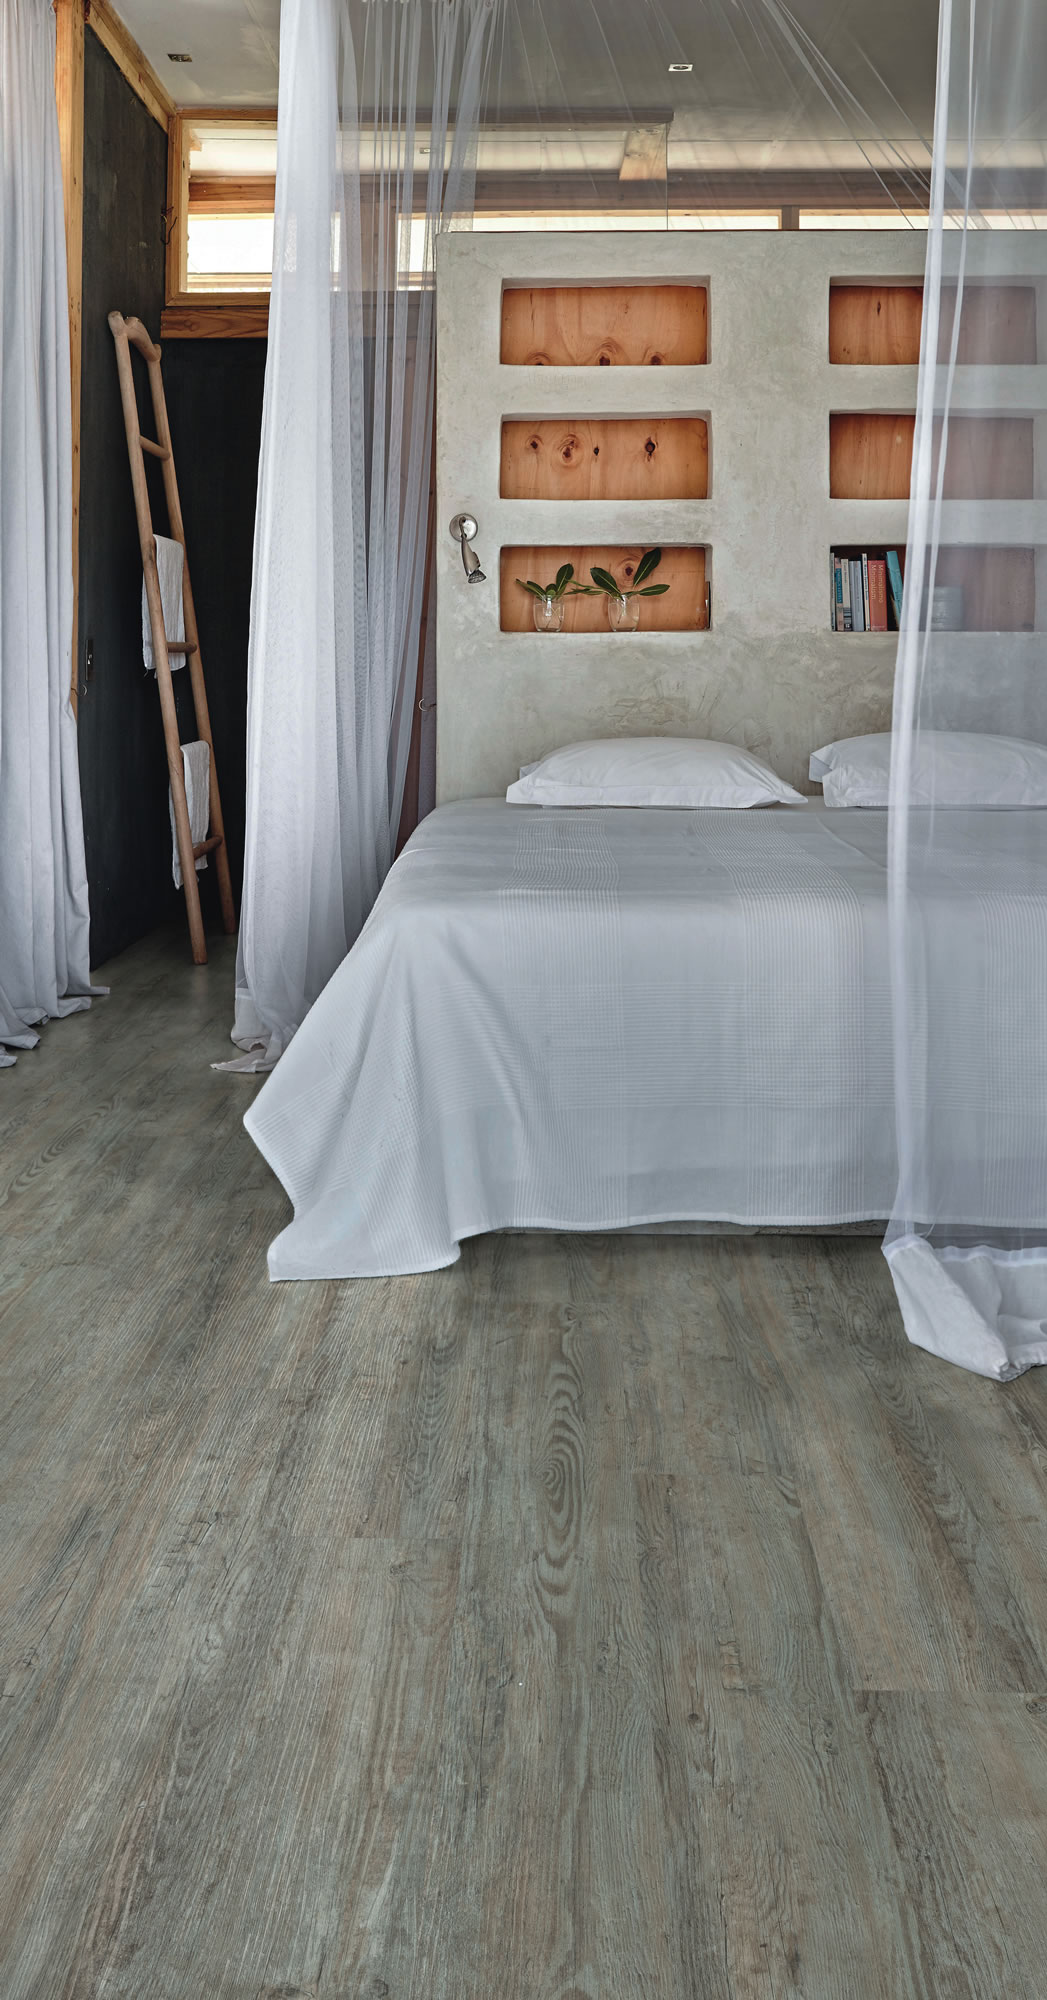 Tlc loc weathered oak 5732 vinyl flooring for Northwest flooring